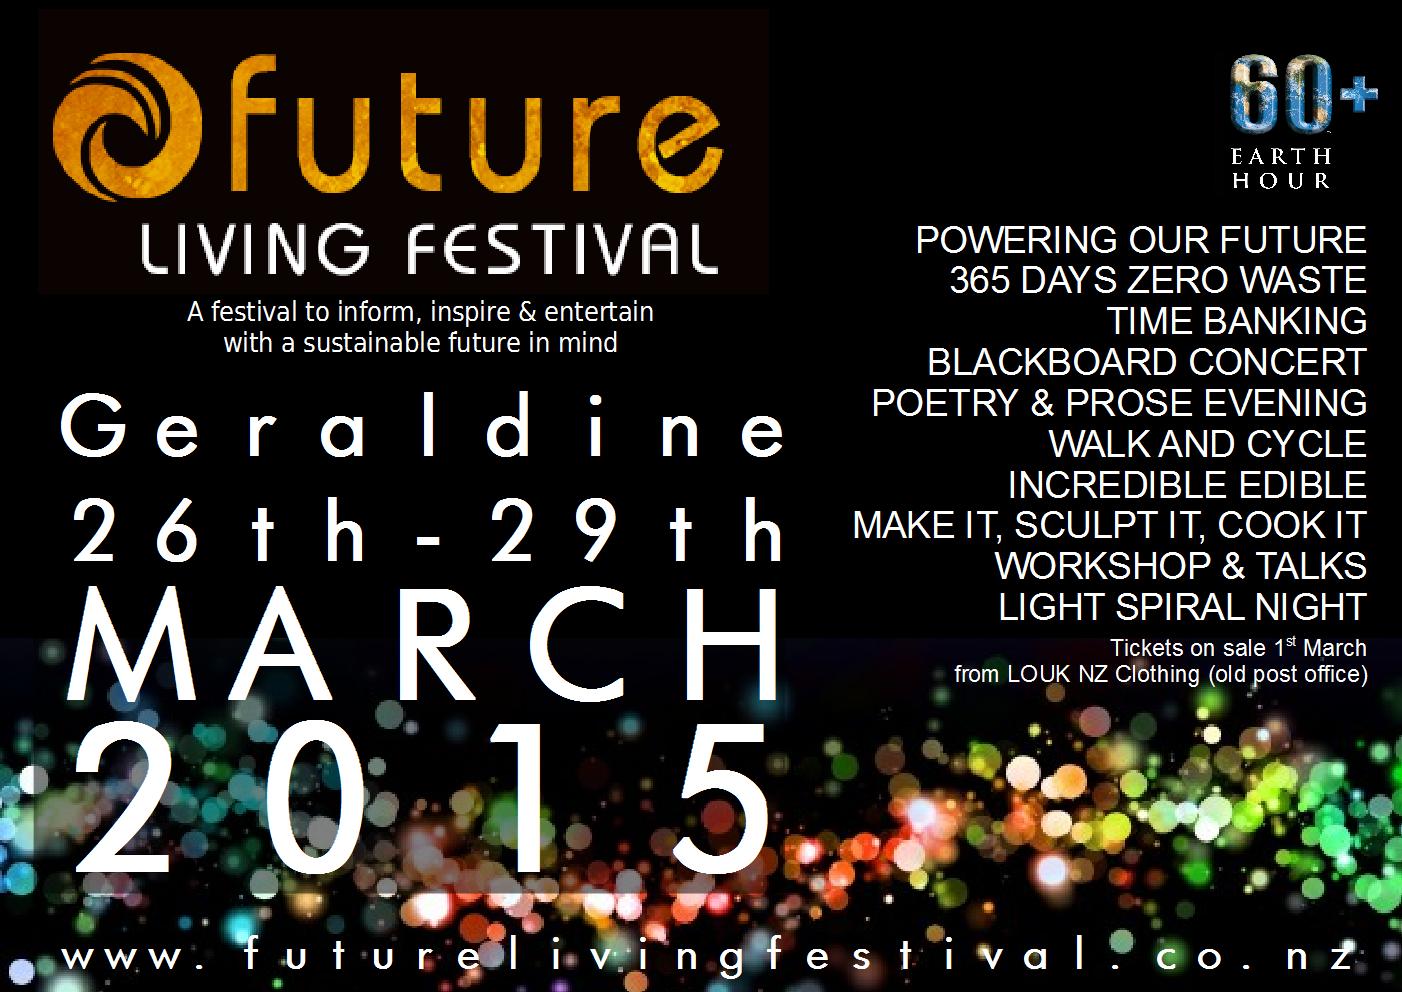 Future Living Festival 2015